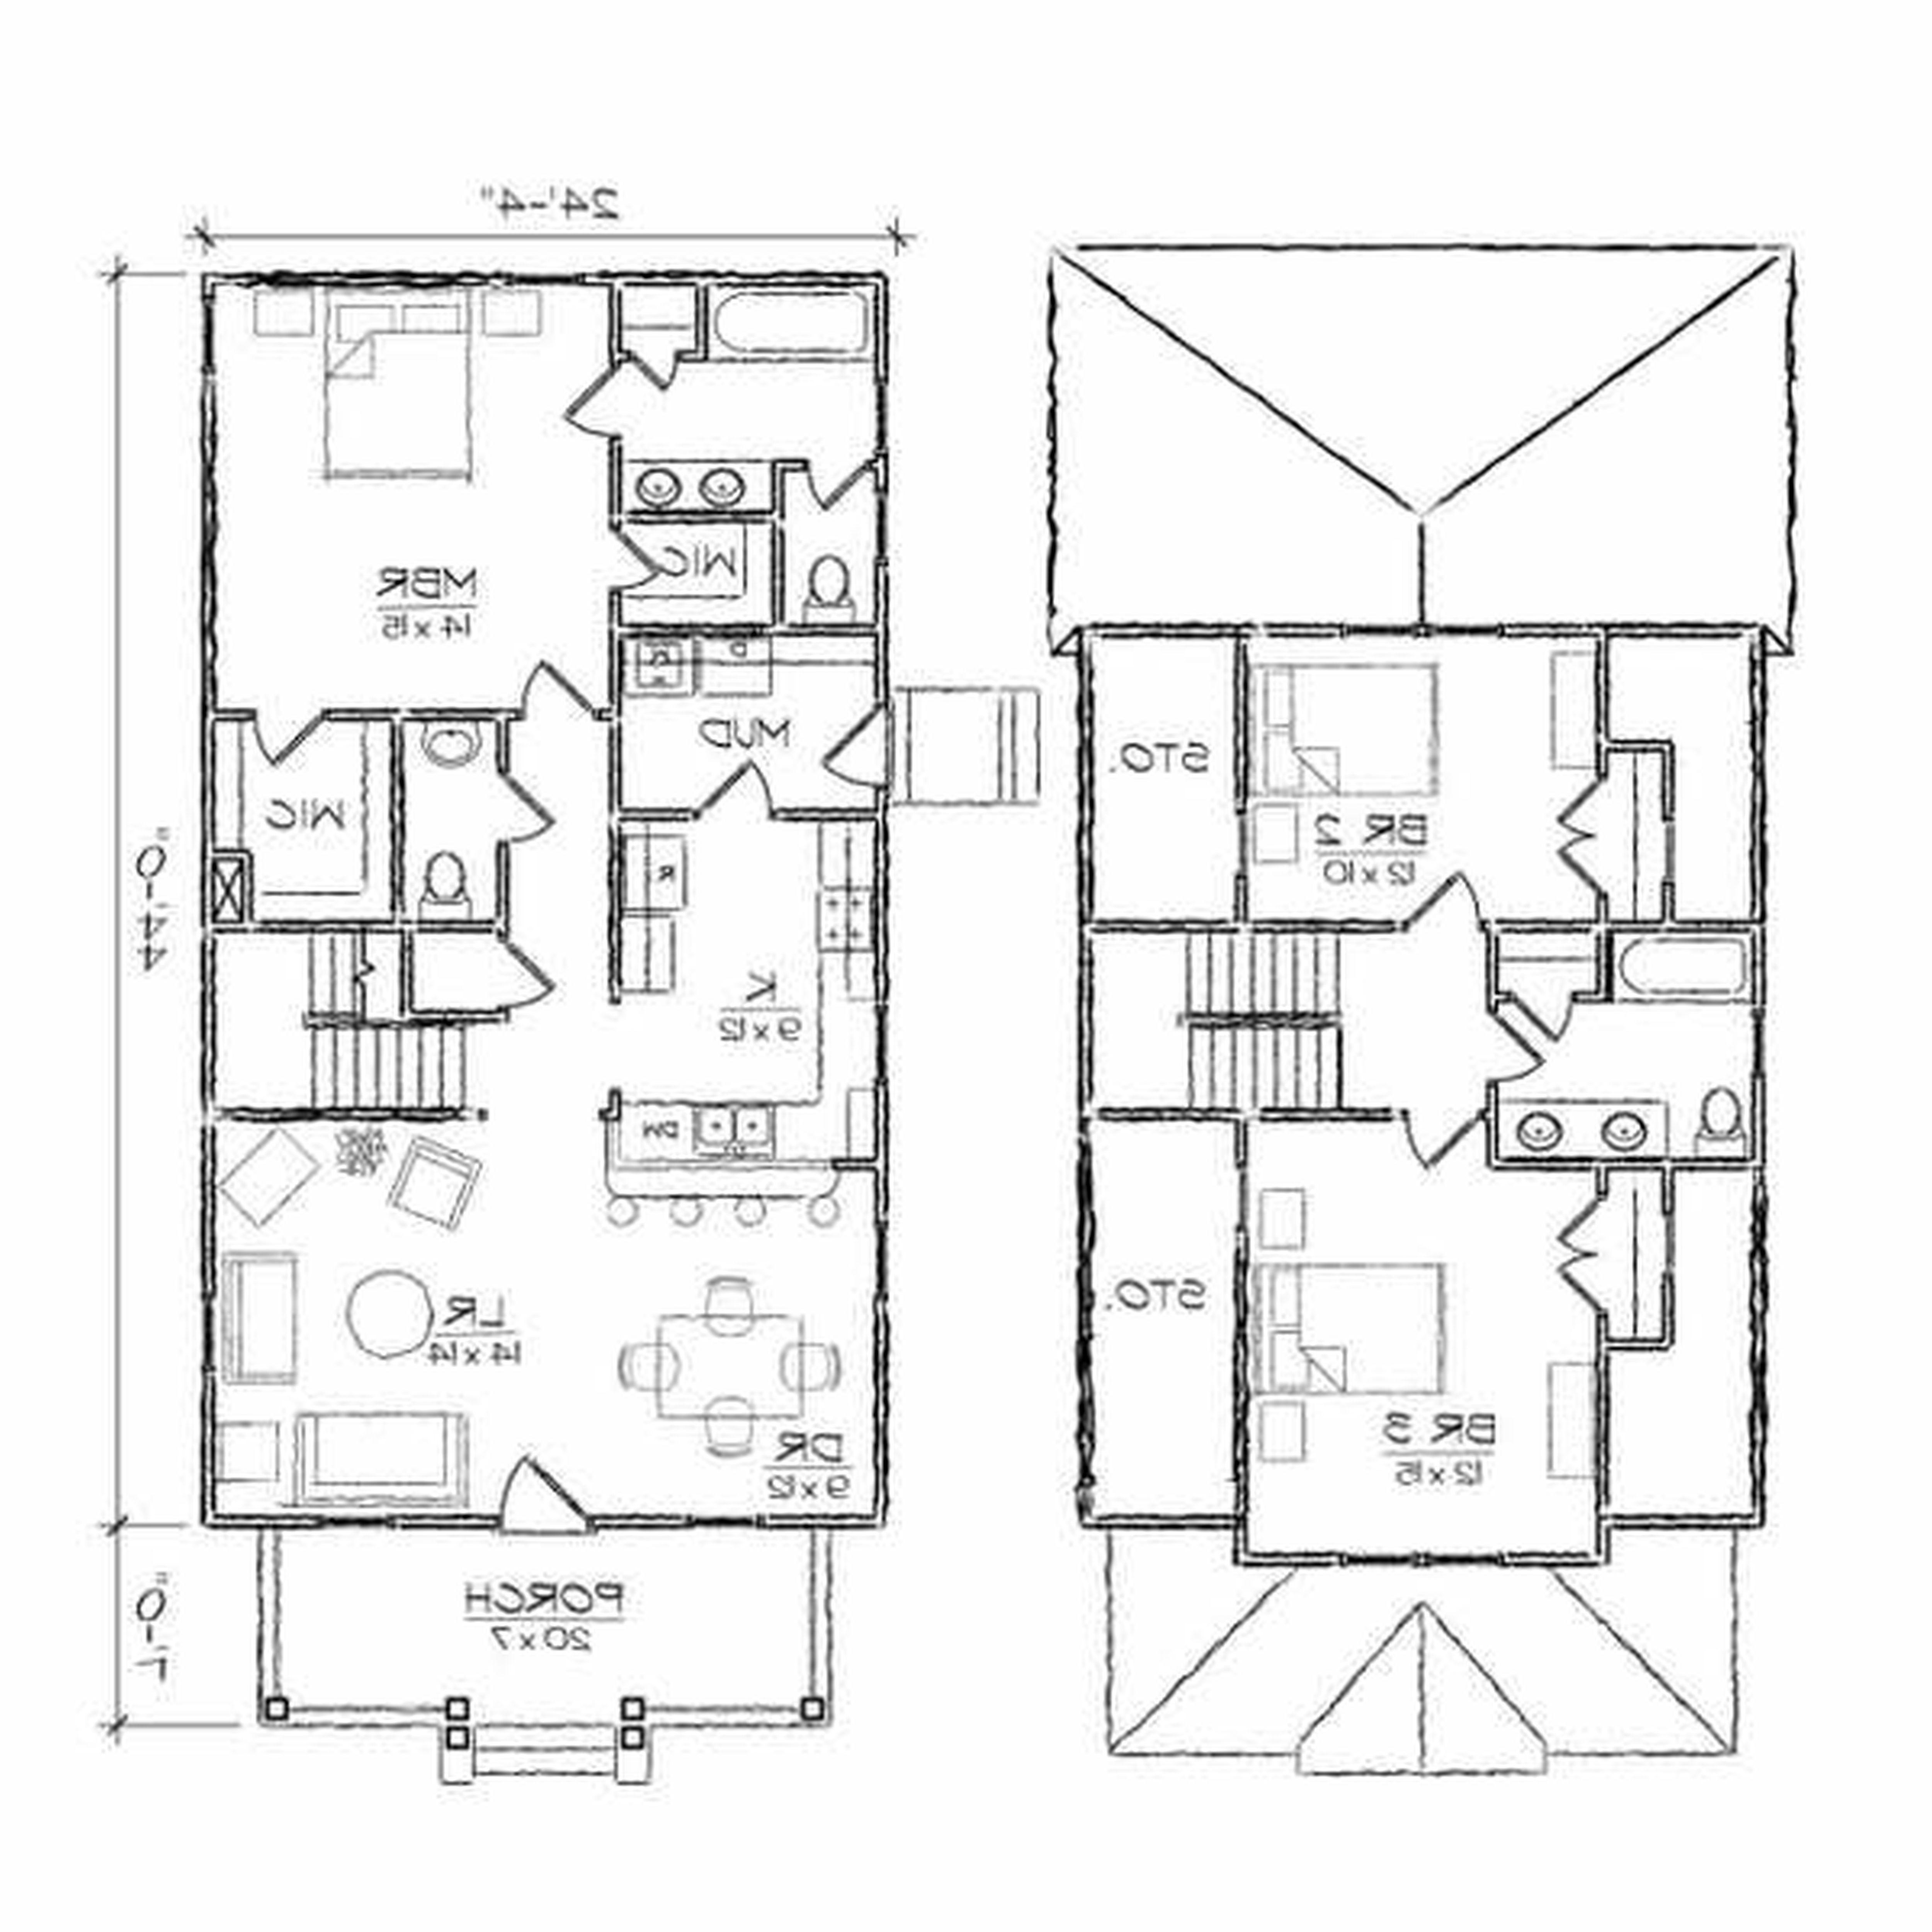 Kitchen Design Software Freeware: Kitchen Design Drawing At GetDrawings